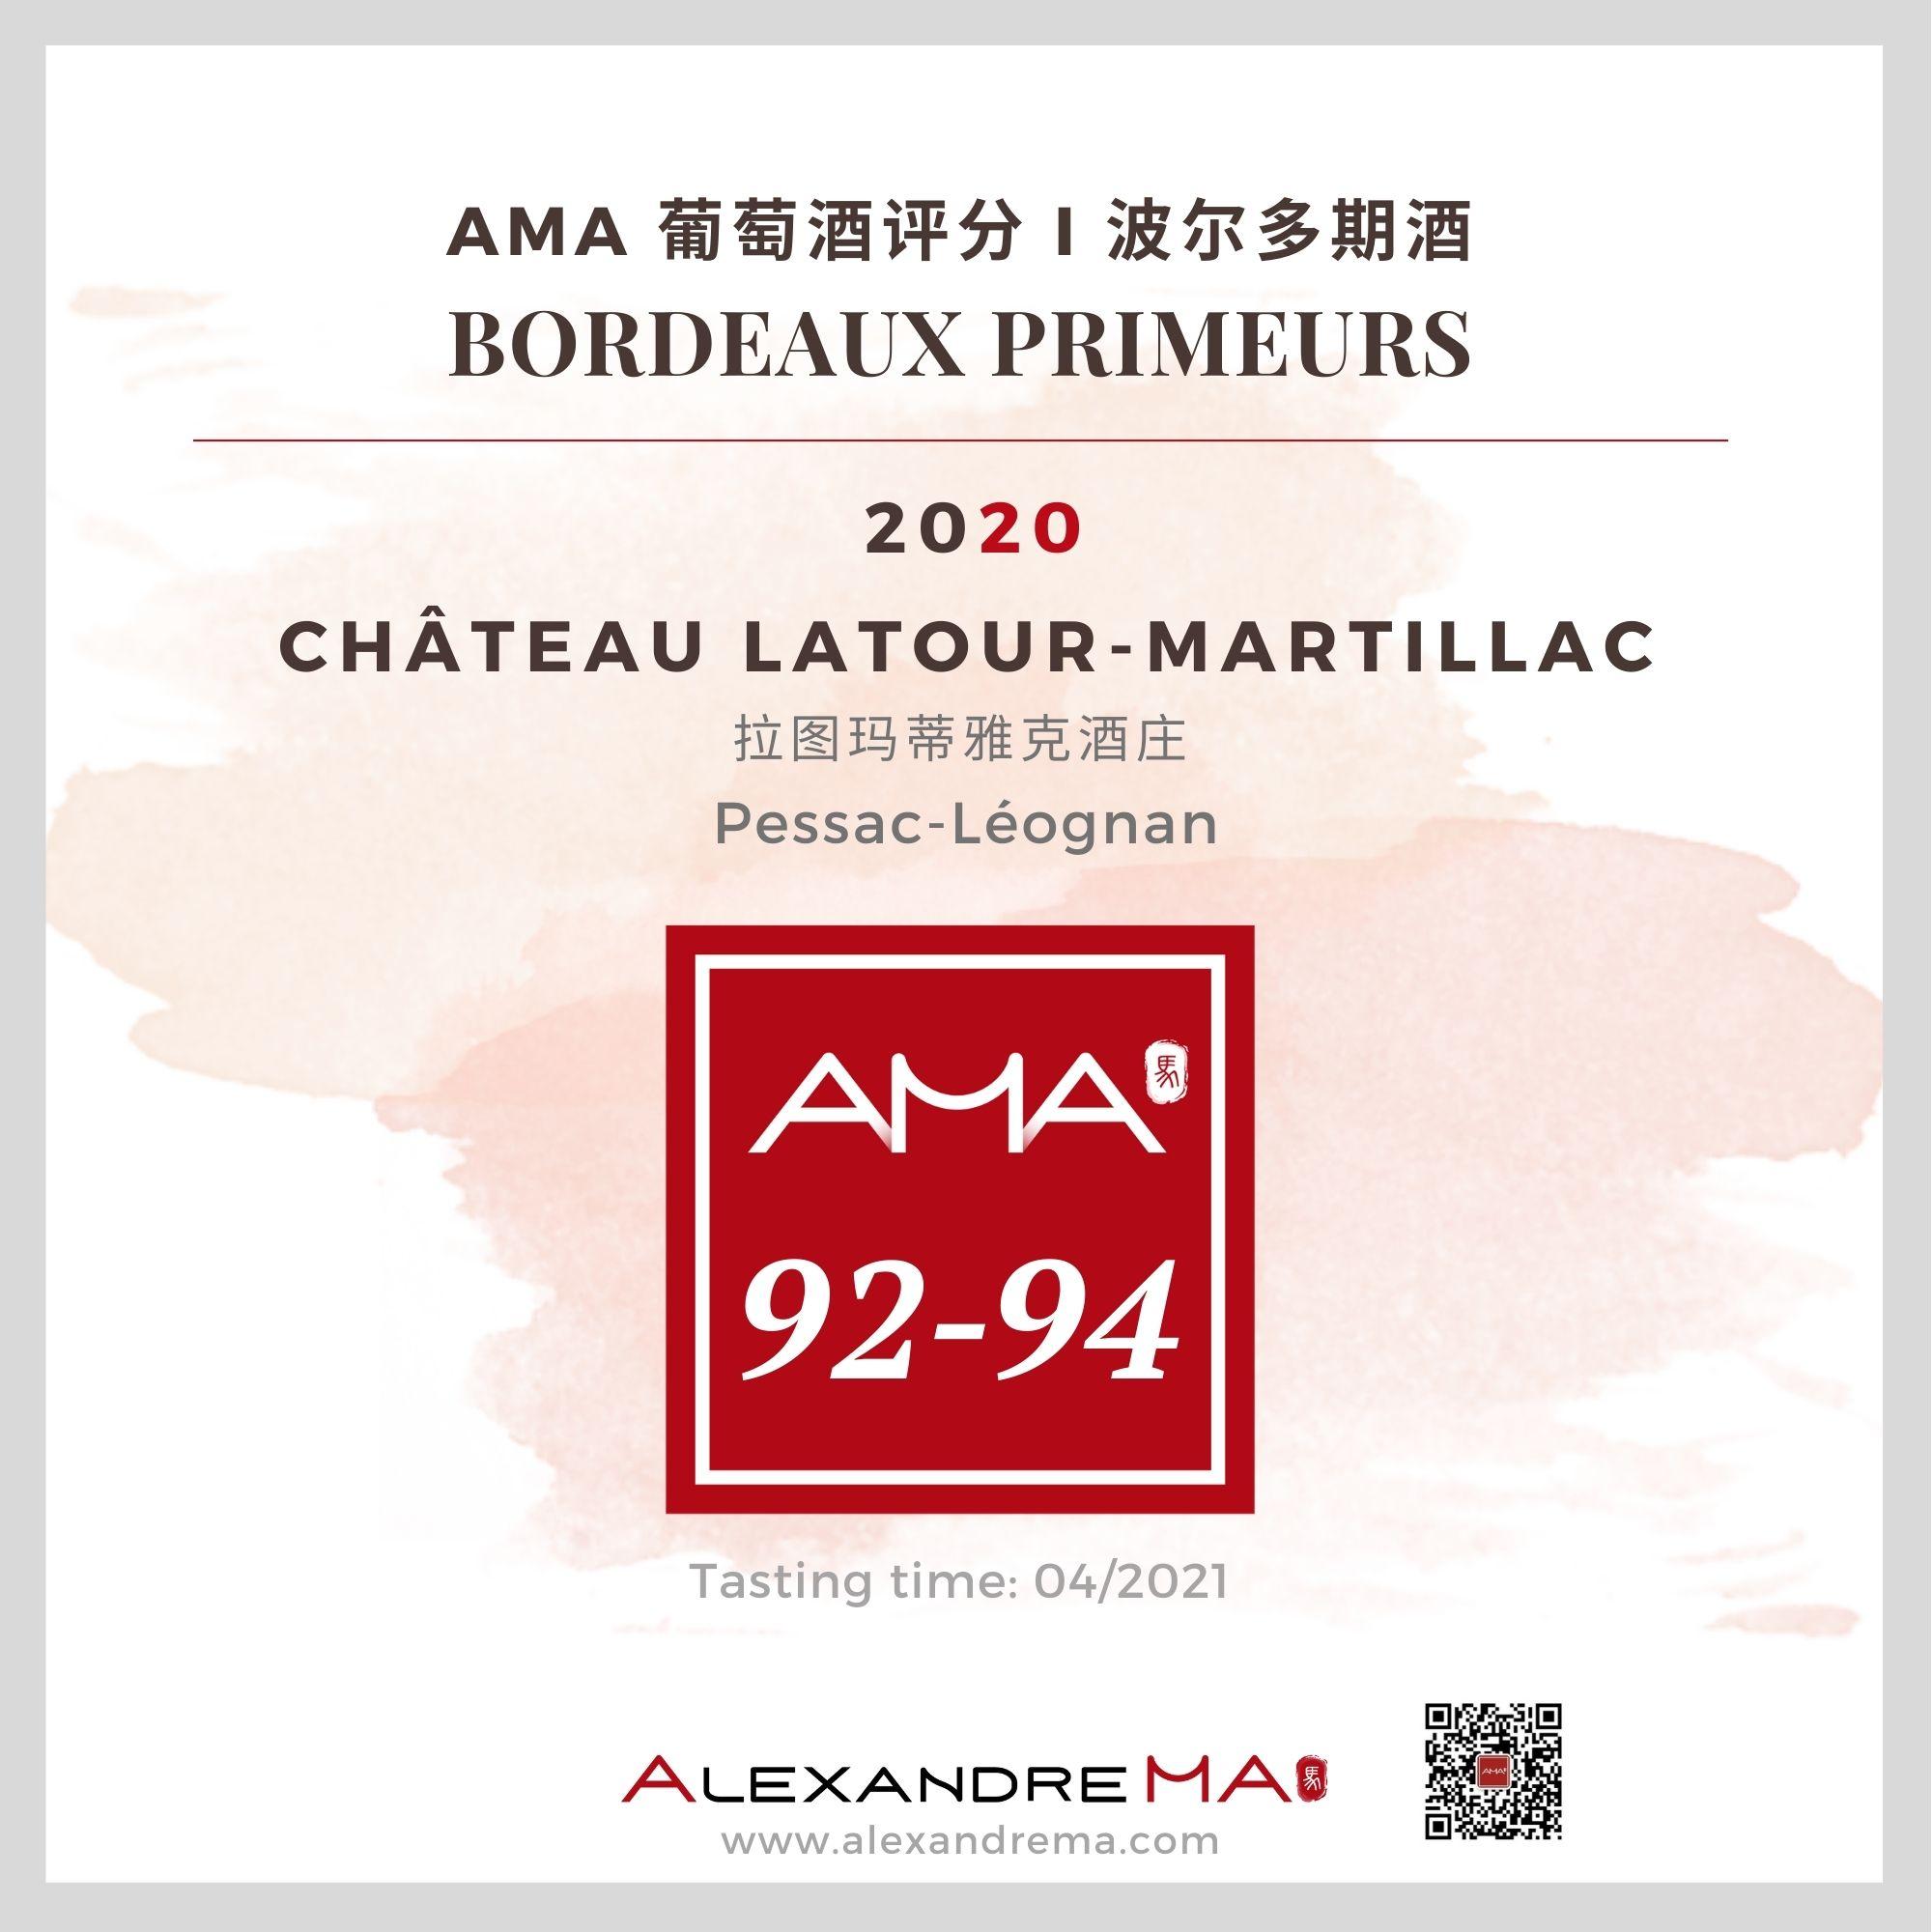 Château Latour-Martillac 2020 拉图玛蒂雅克酒庄 - Alexandre Ma